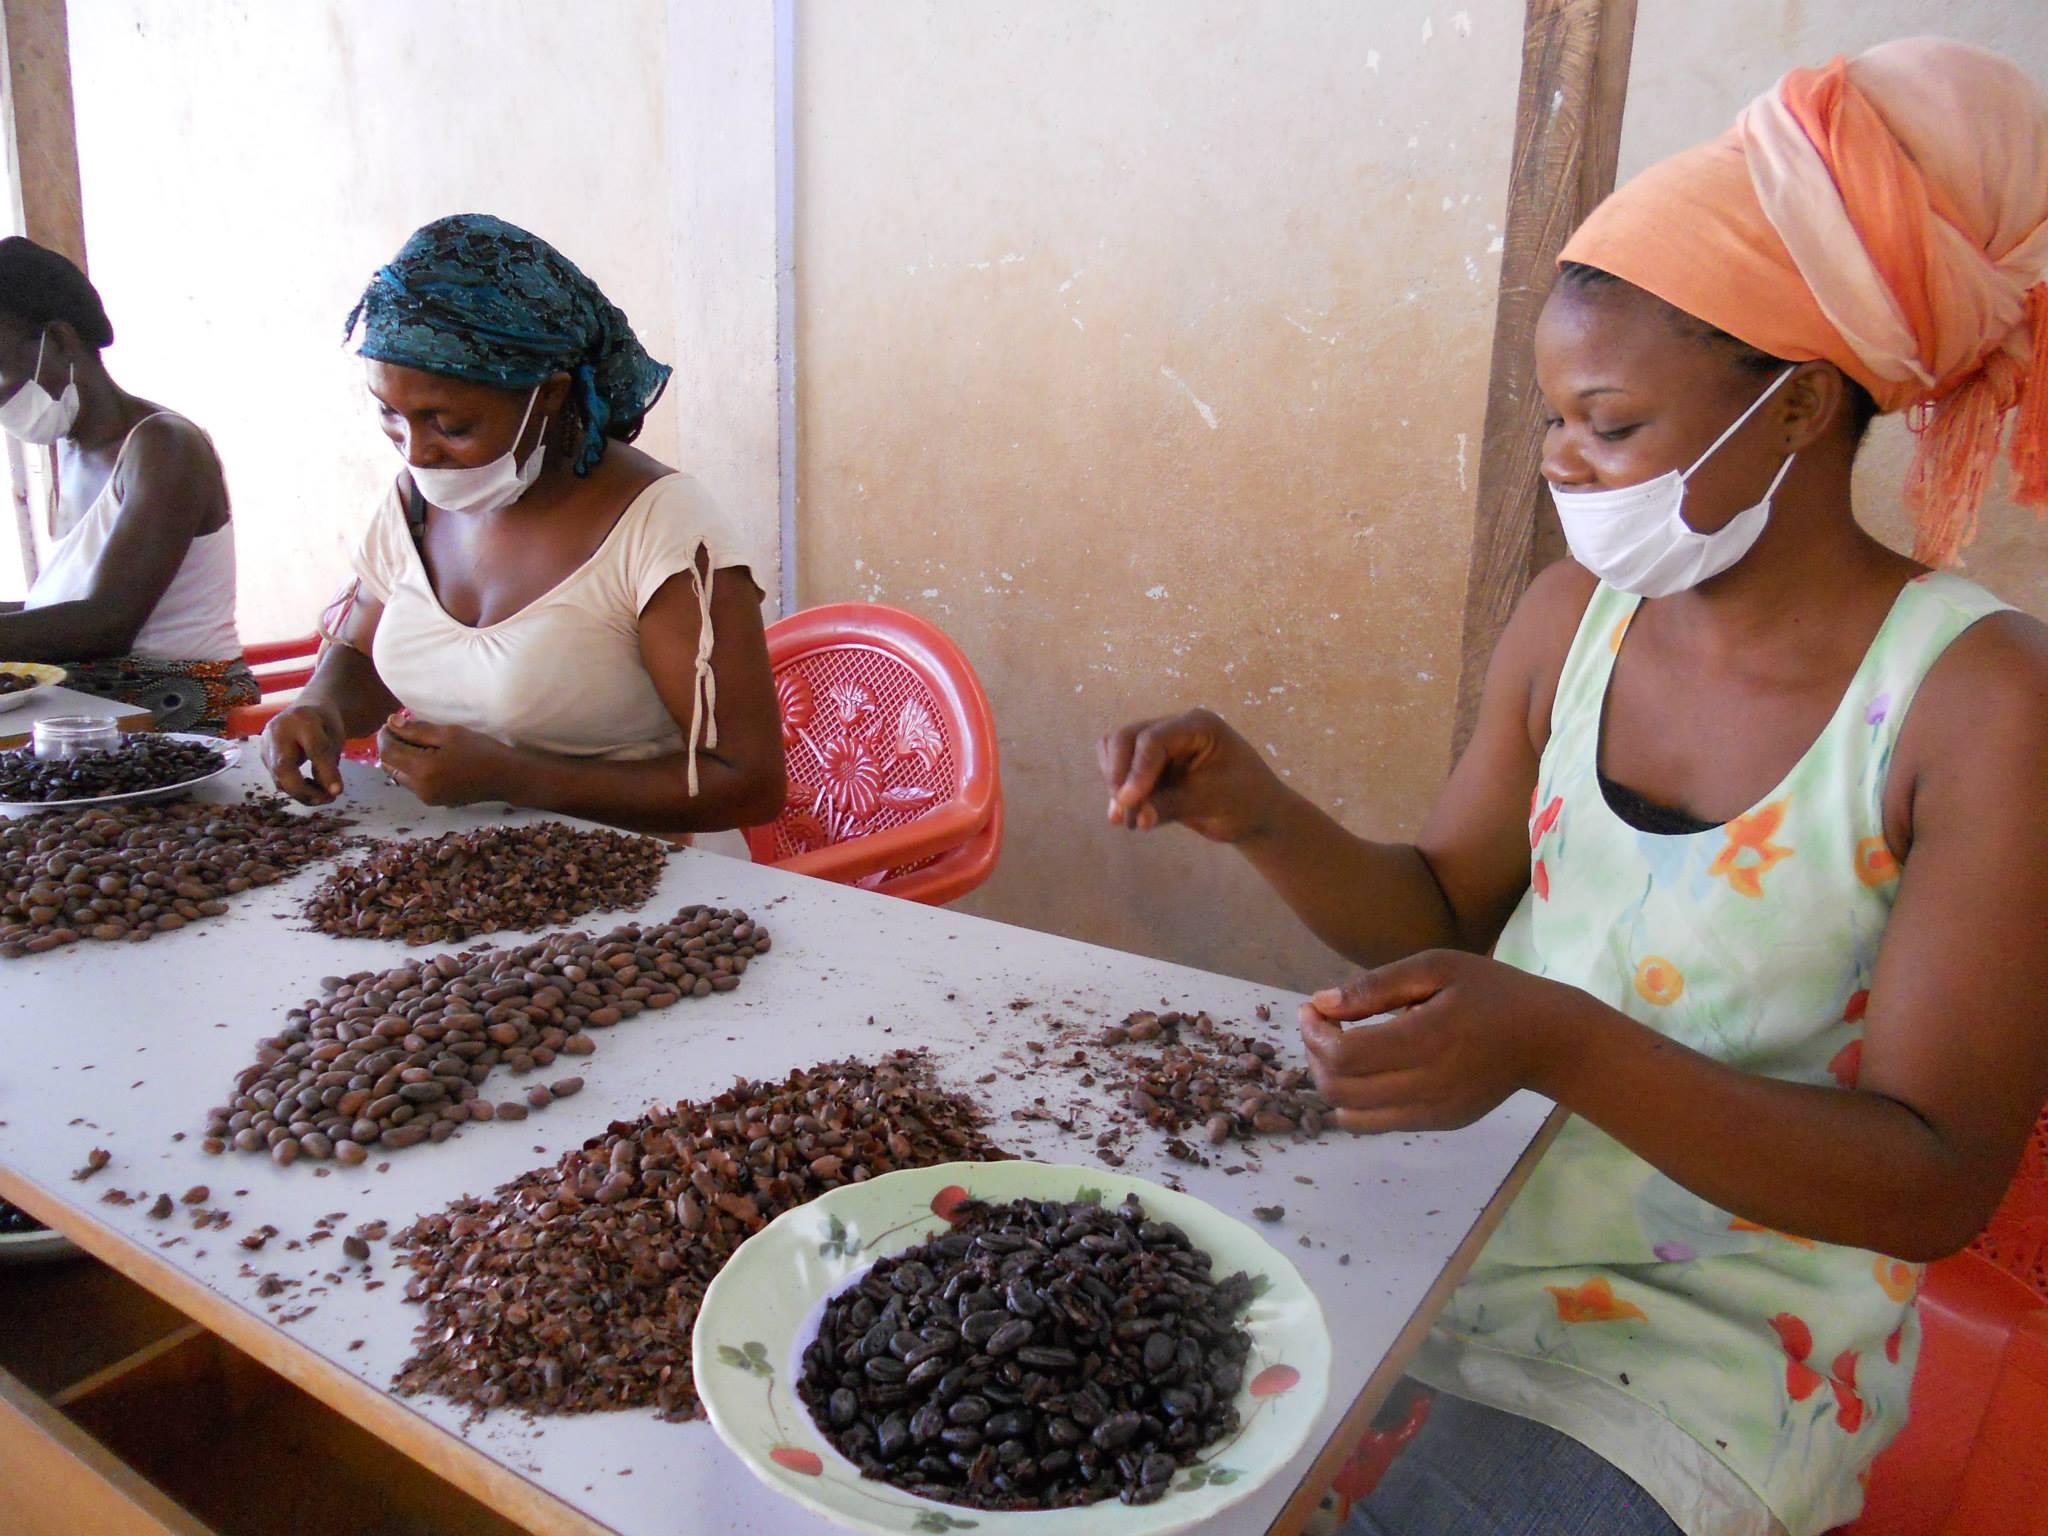 Choco Togo sees itself as job generator.